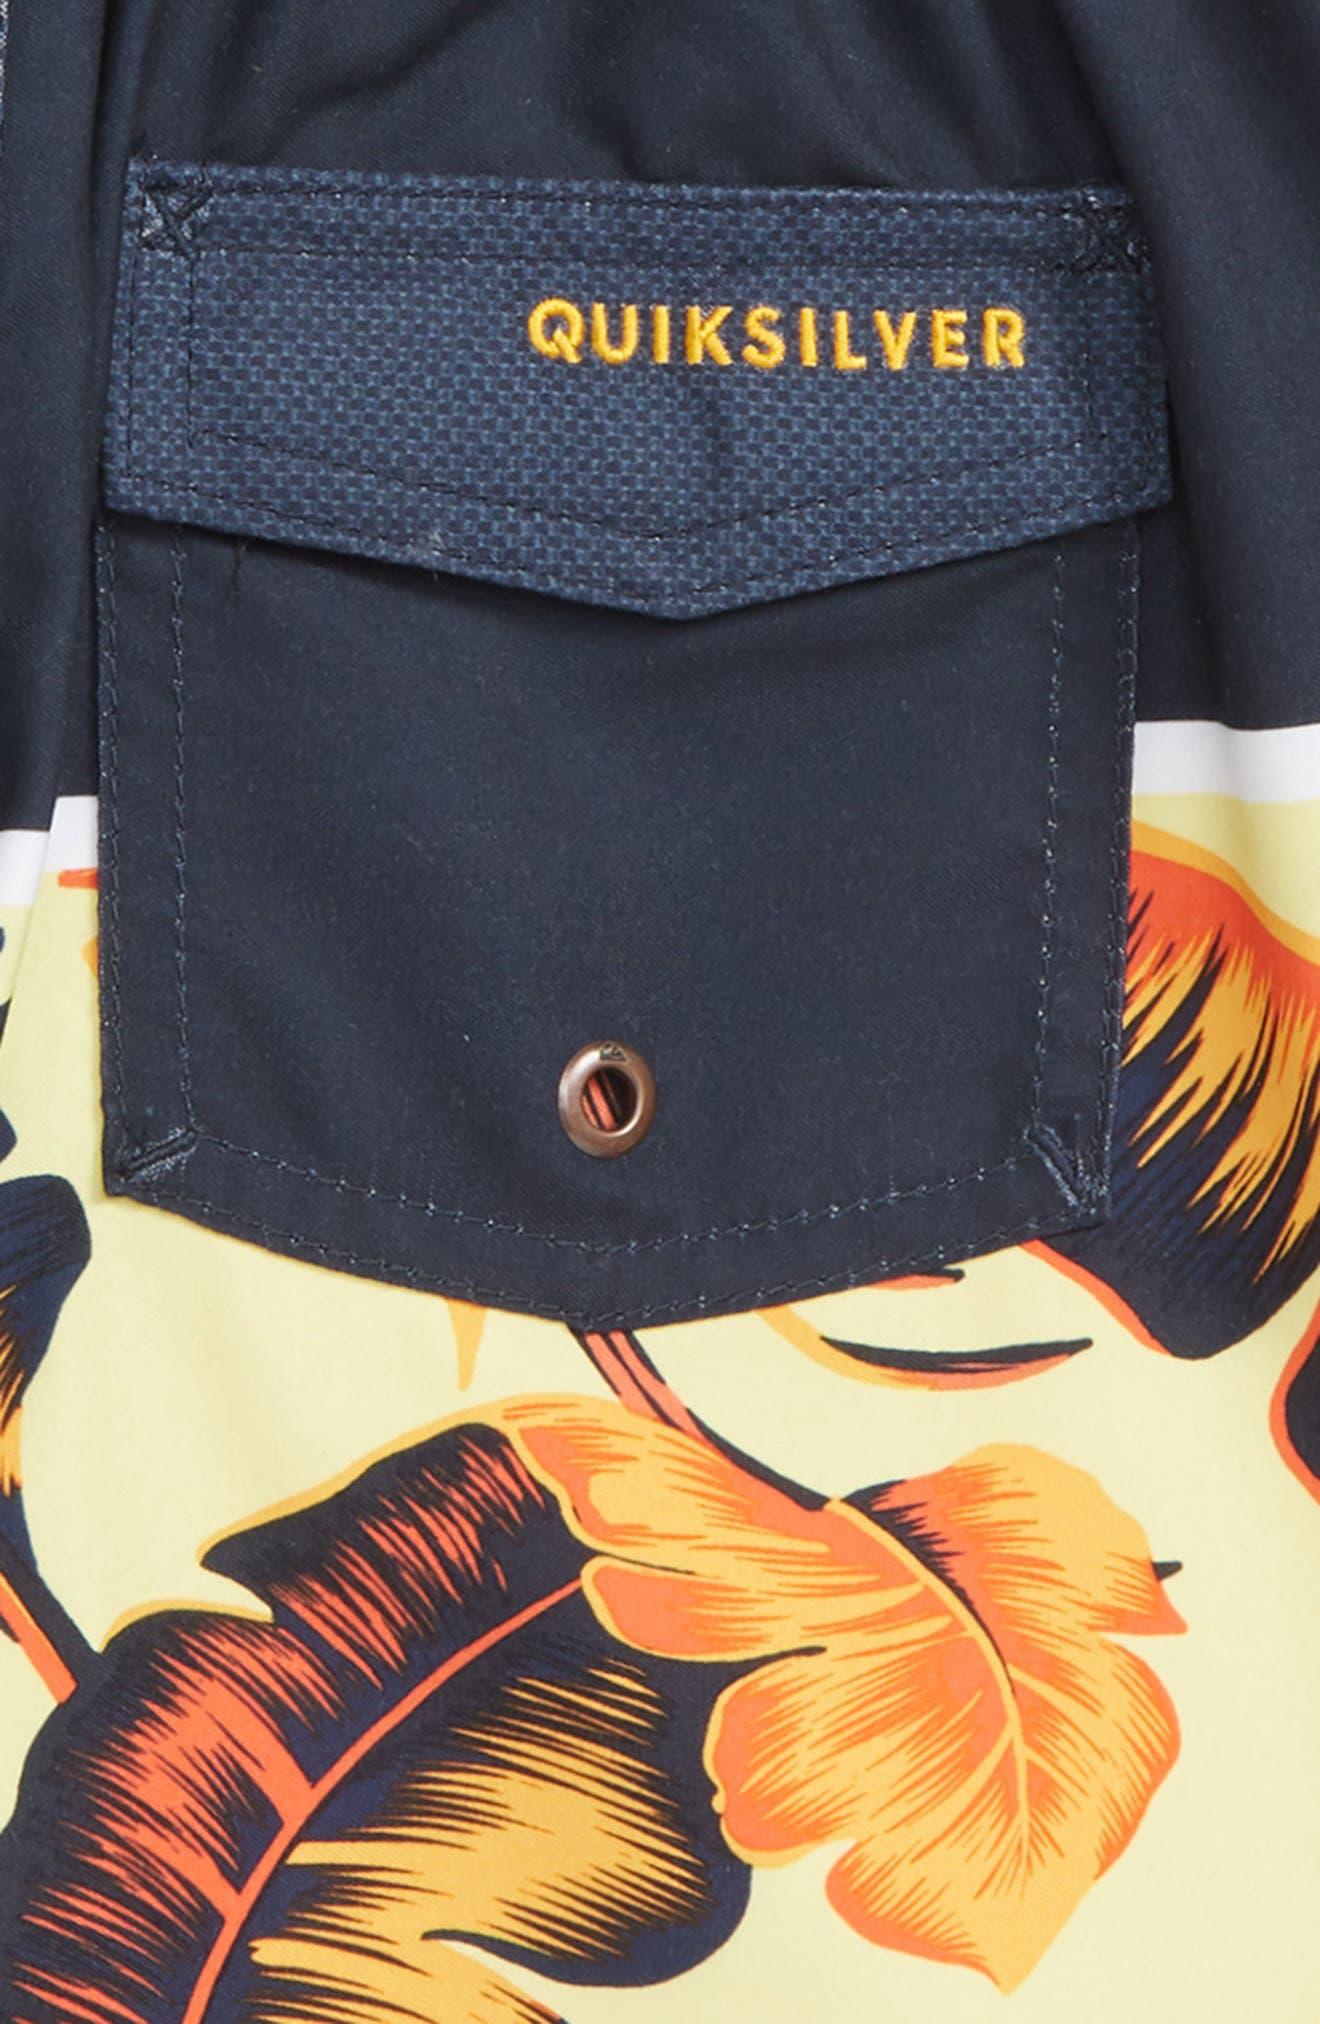 QUIKSILVER,                             Everyday Noosa Board Shorts,                             Alternate thumbnail 3, color,                             NAVY BLAZER